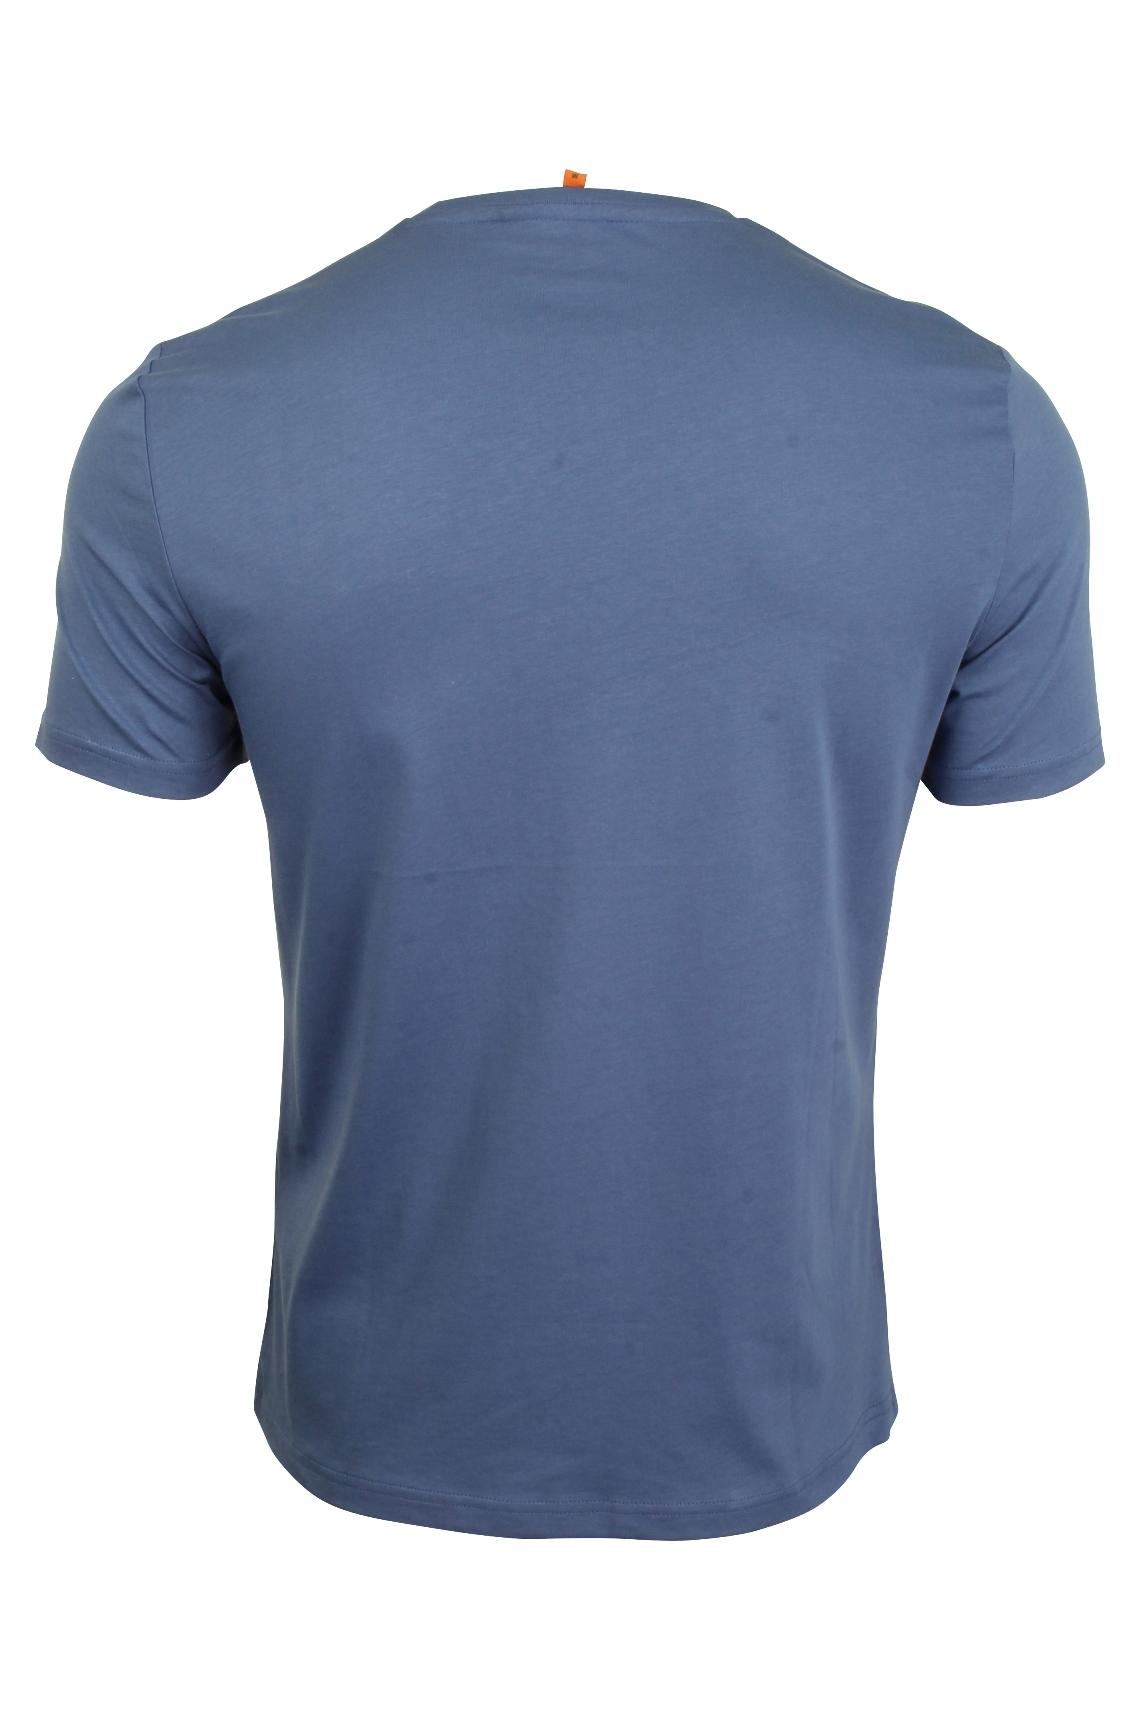 Mens-Classic-Spade-Pocket-T-Shirt-by-Ben-Sherman thumbnail 19